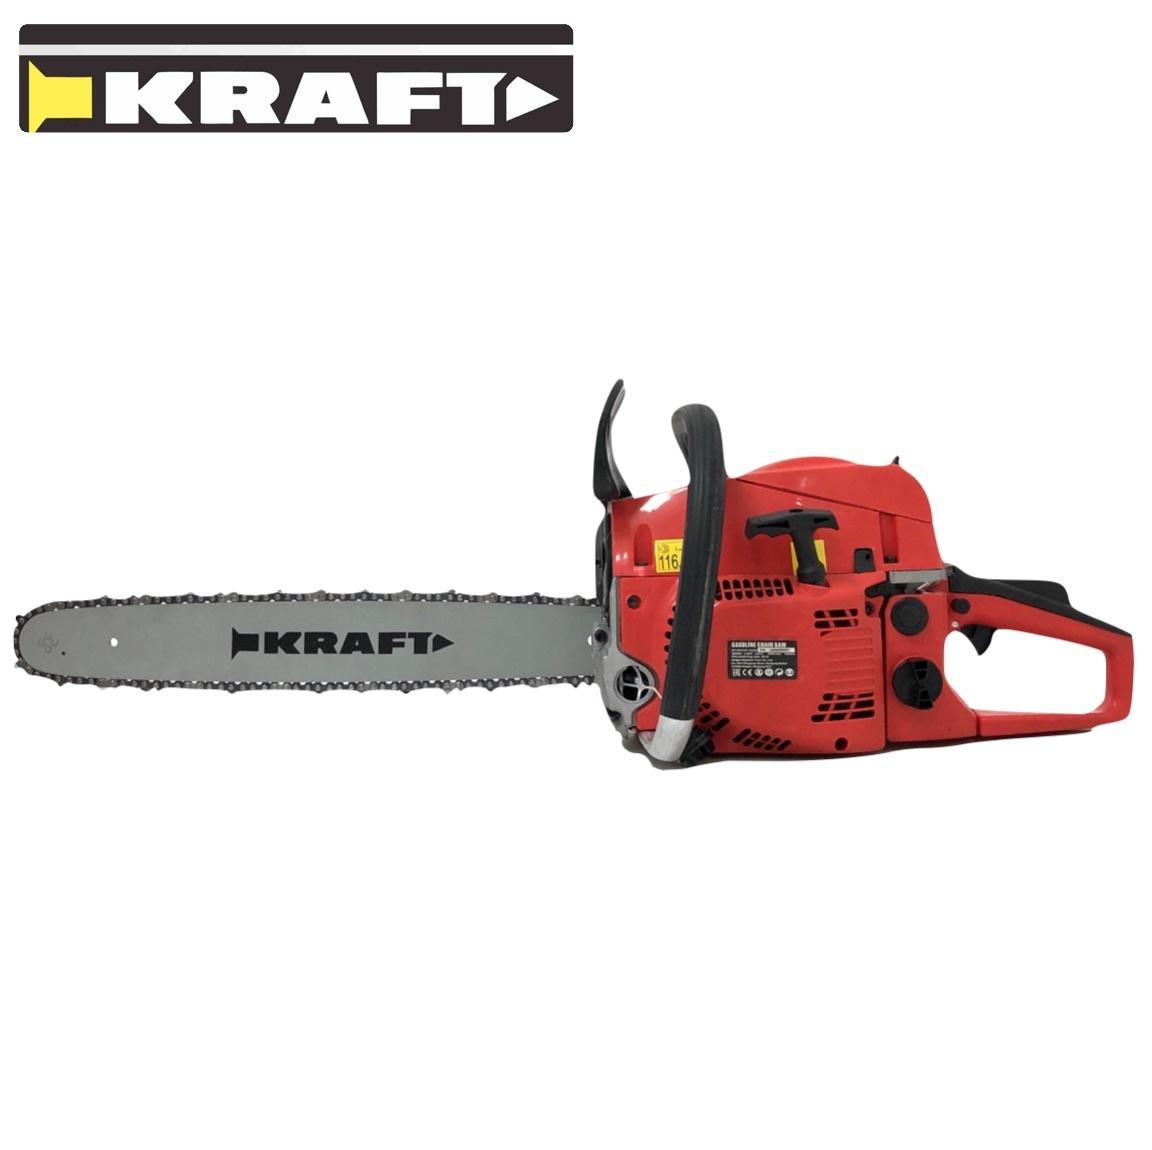 Kraft Benzine Kettingzaag 3,8pK 52cc 2850W 450mm